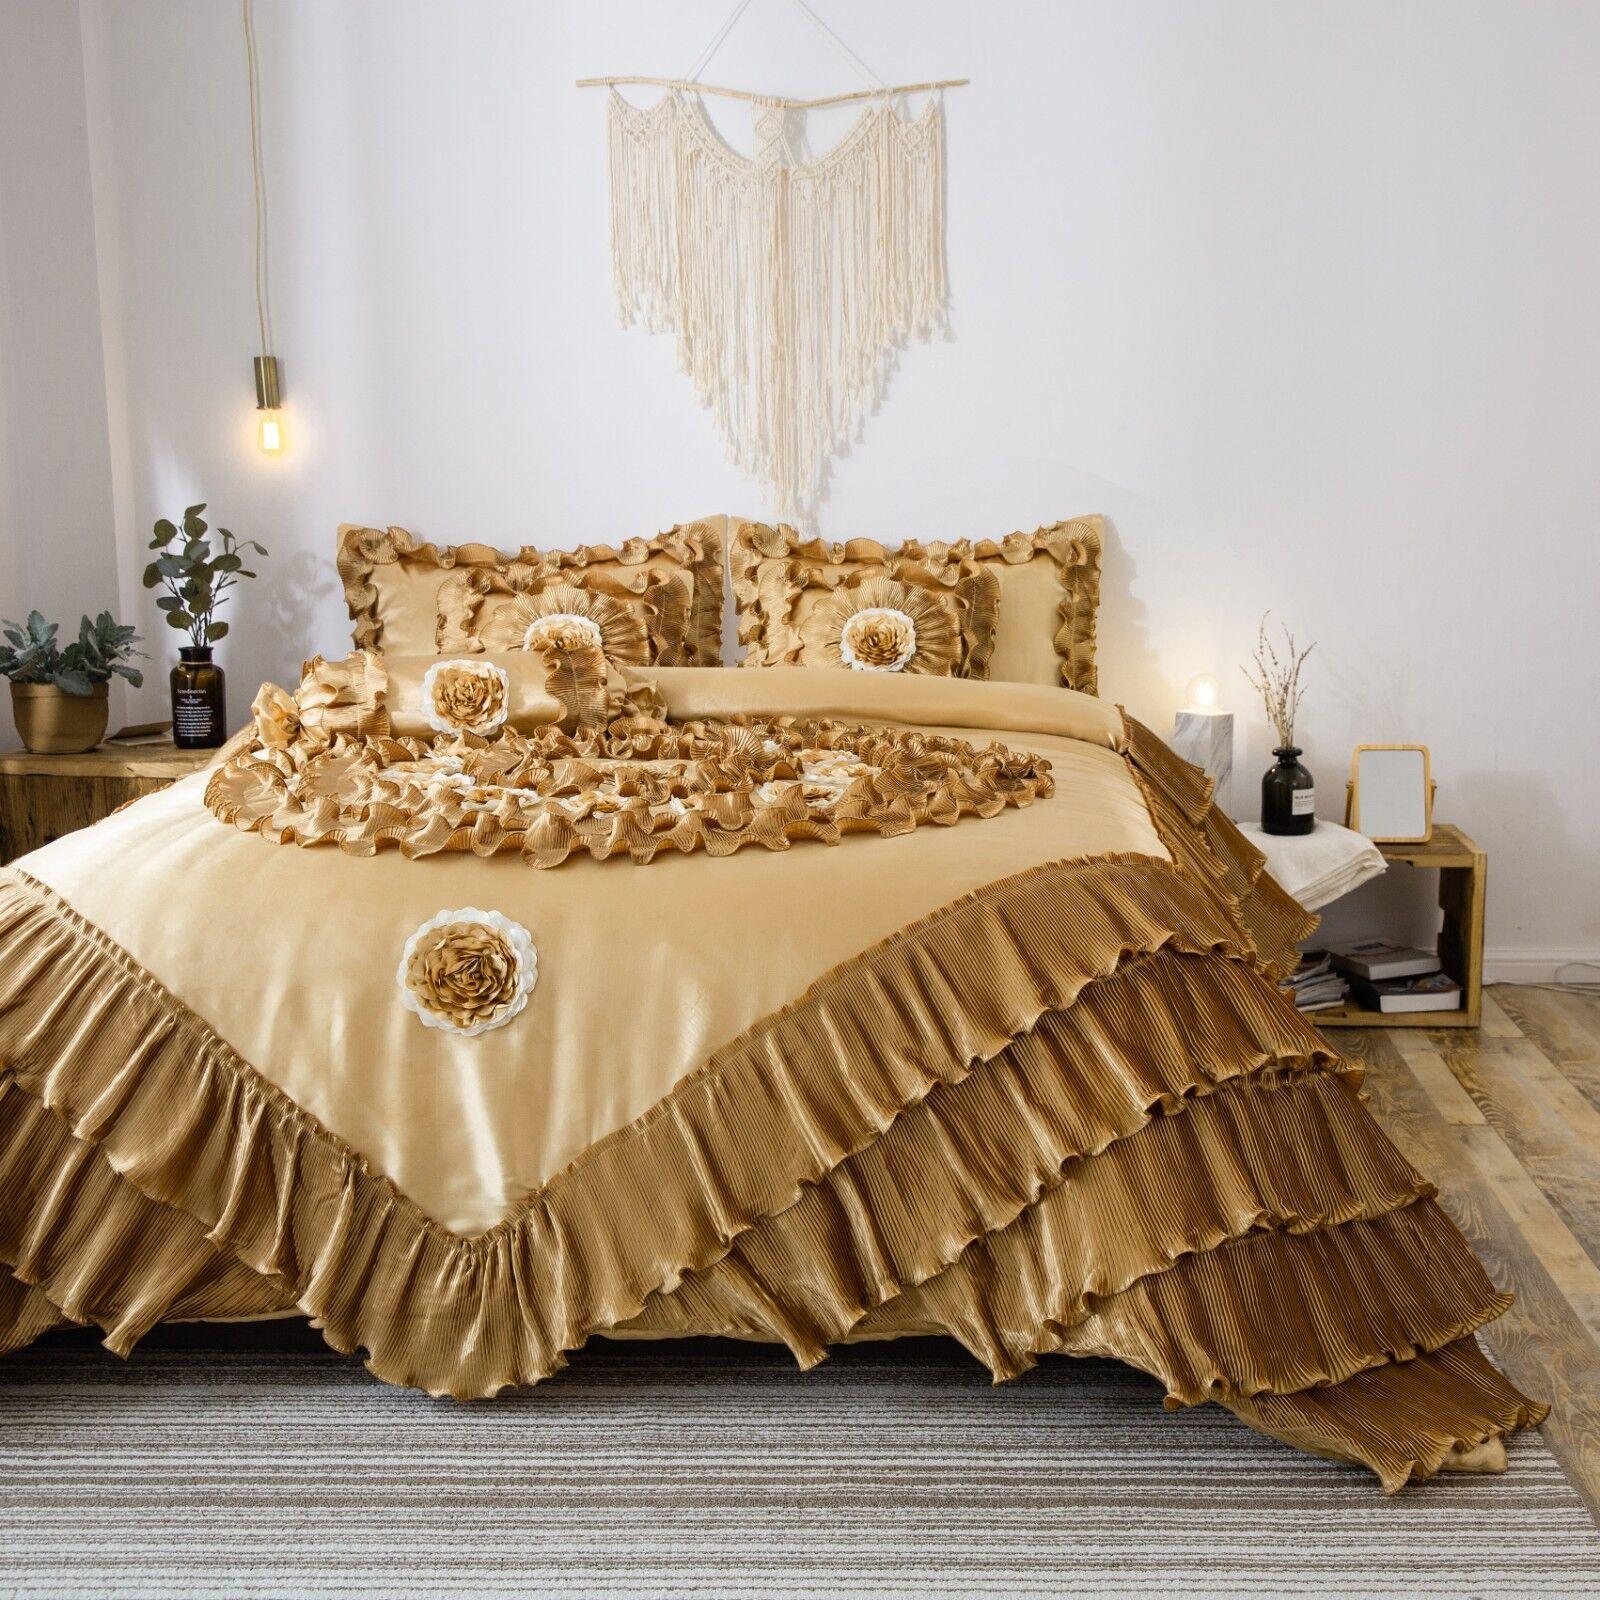 Tache 6 PC Floral Solid Luxury Caramel Latte Ruffle Comforter Quilt Set,oro